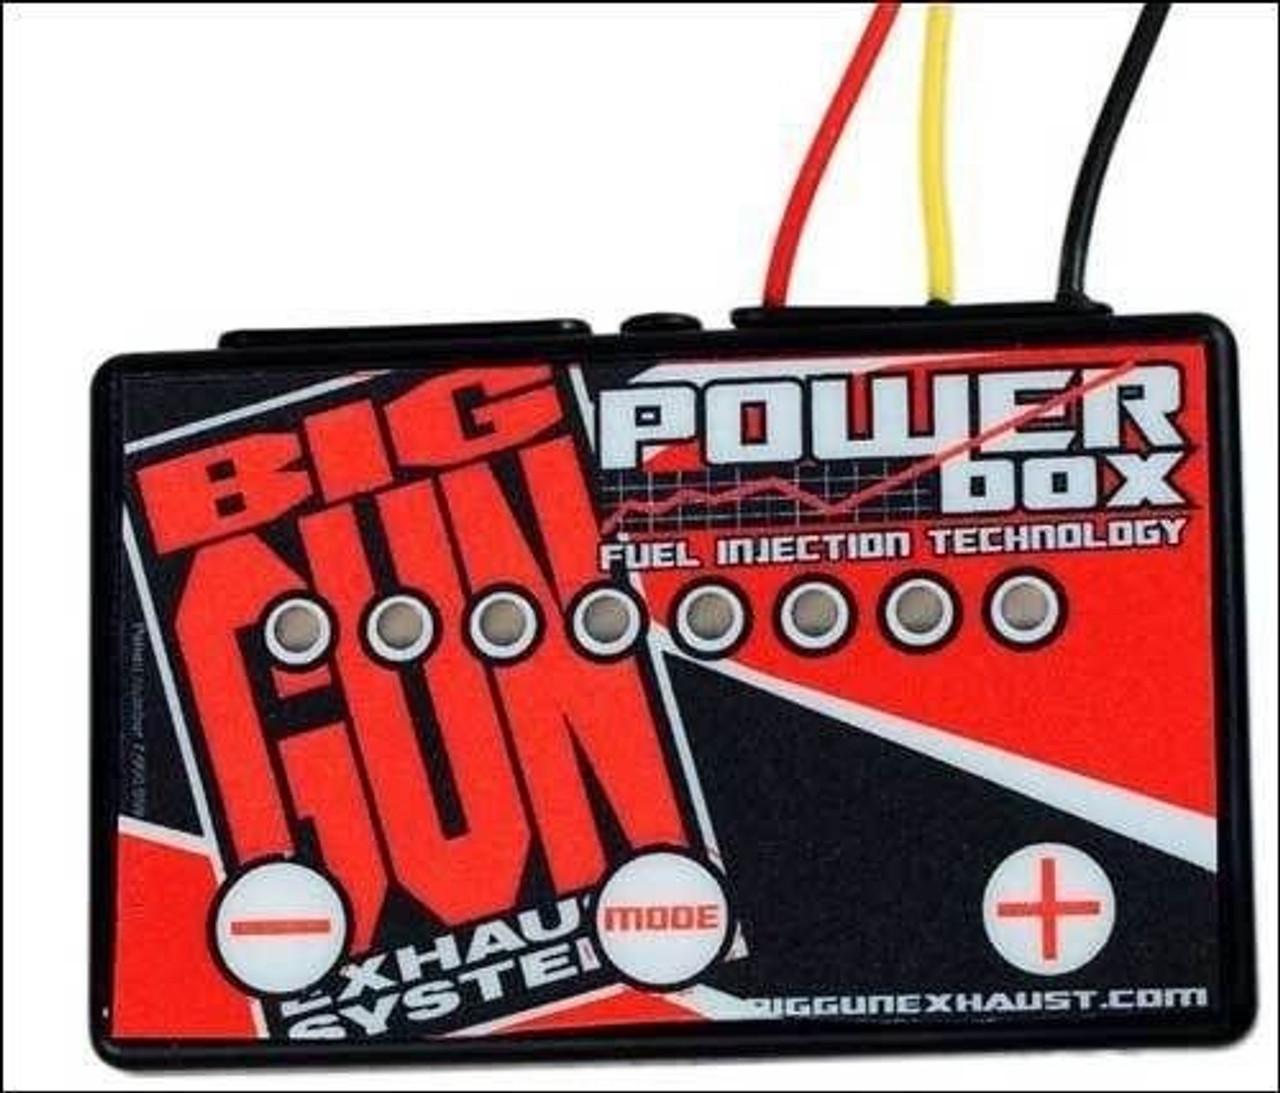 Big Gun EFI TFI Fuel Controller Power Box Yamaha Yfz450r Yfz 450r 15-19 40-R57G